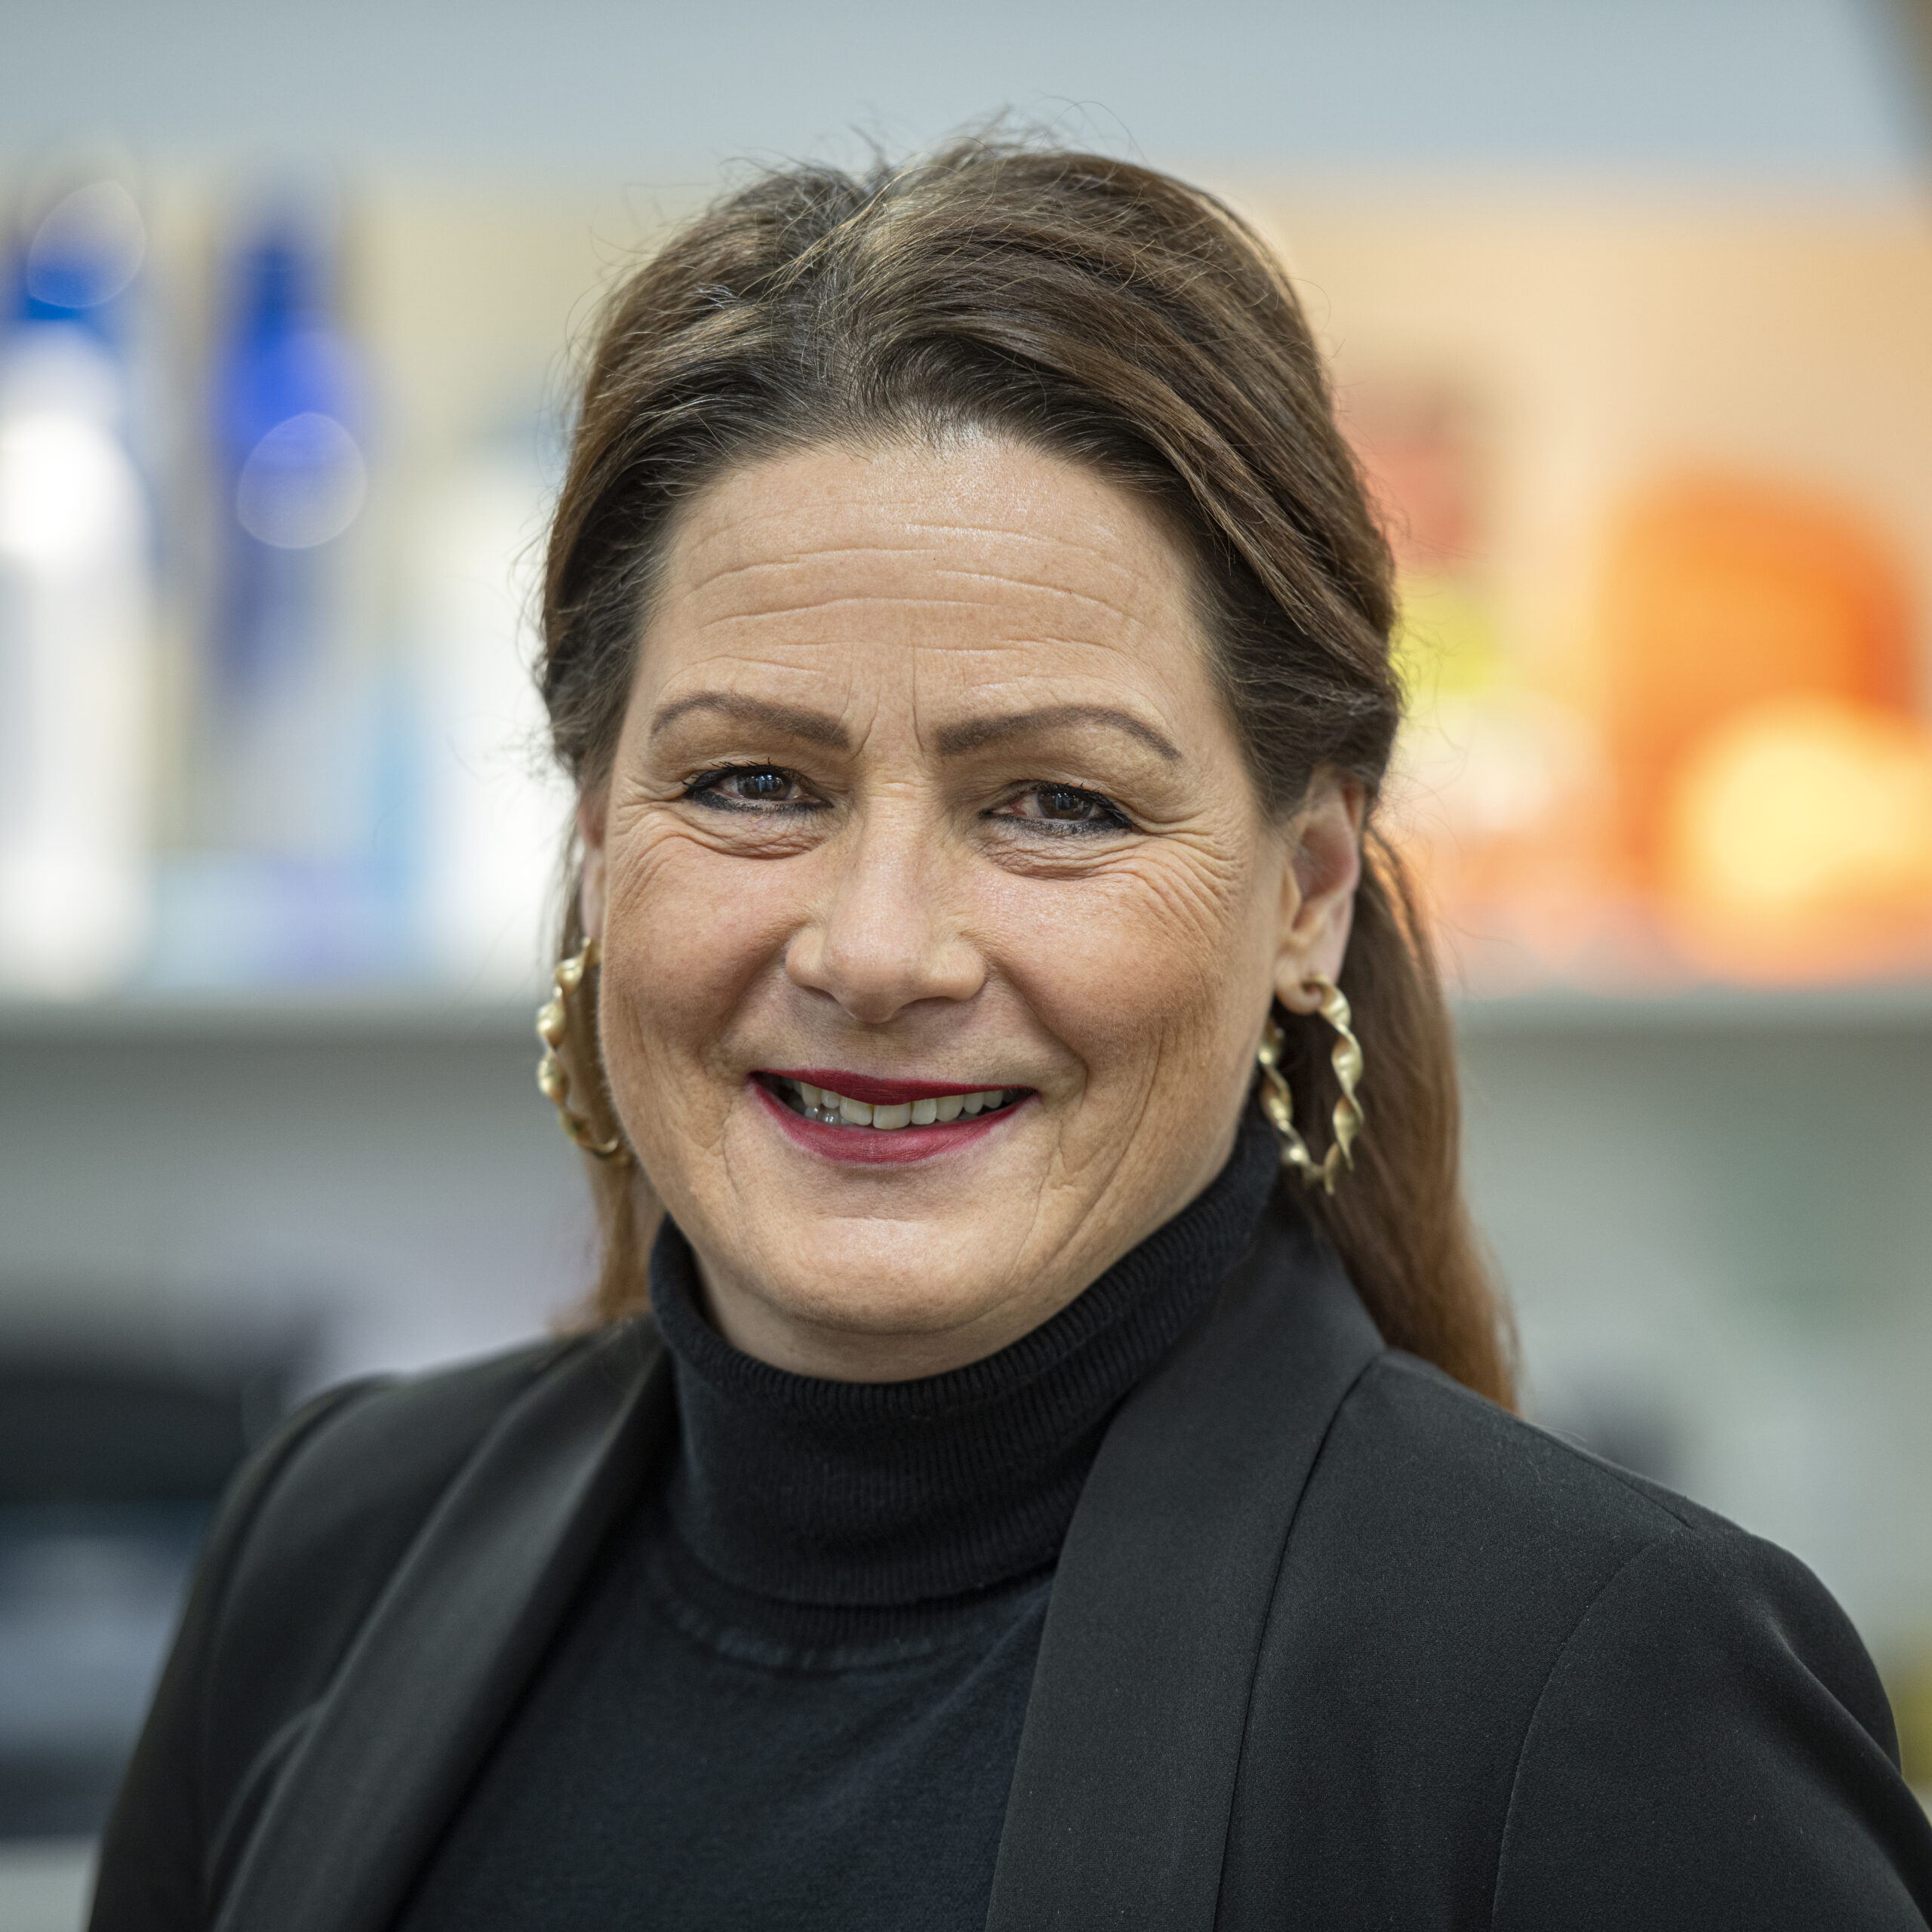 Karin van Velzen